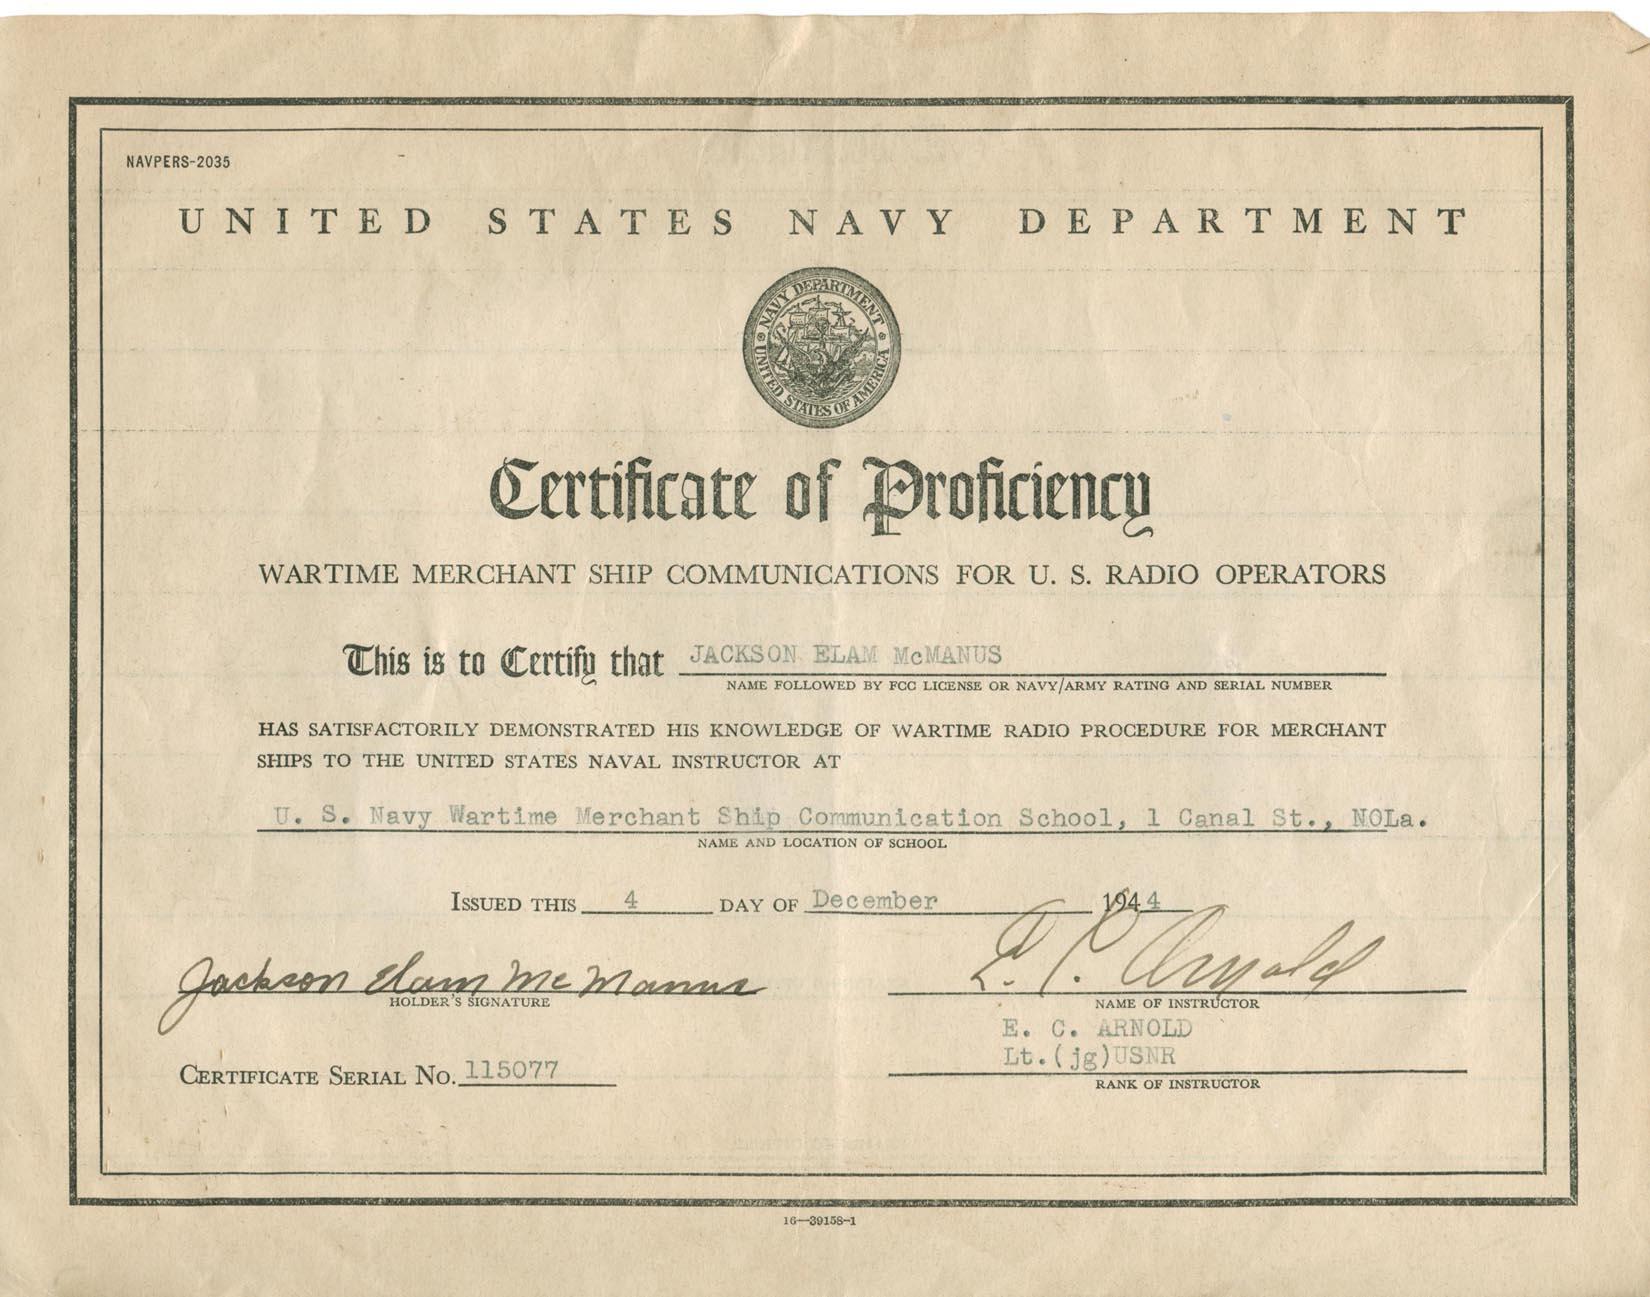 Radio Operator Certificate Of Proficiency